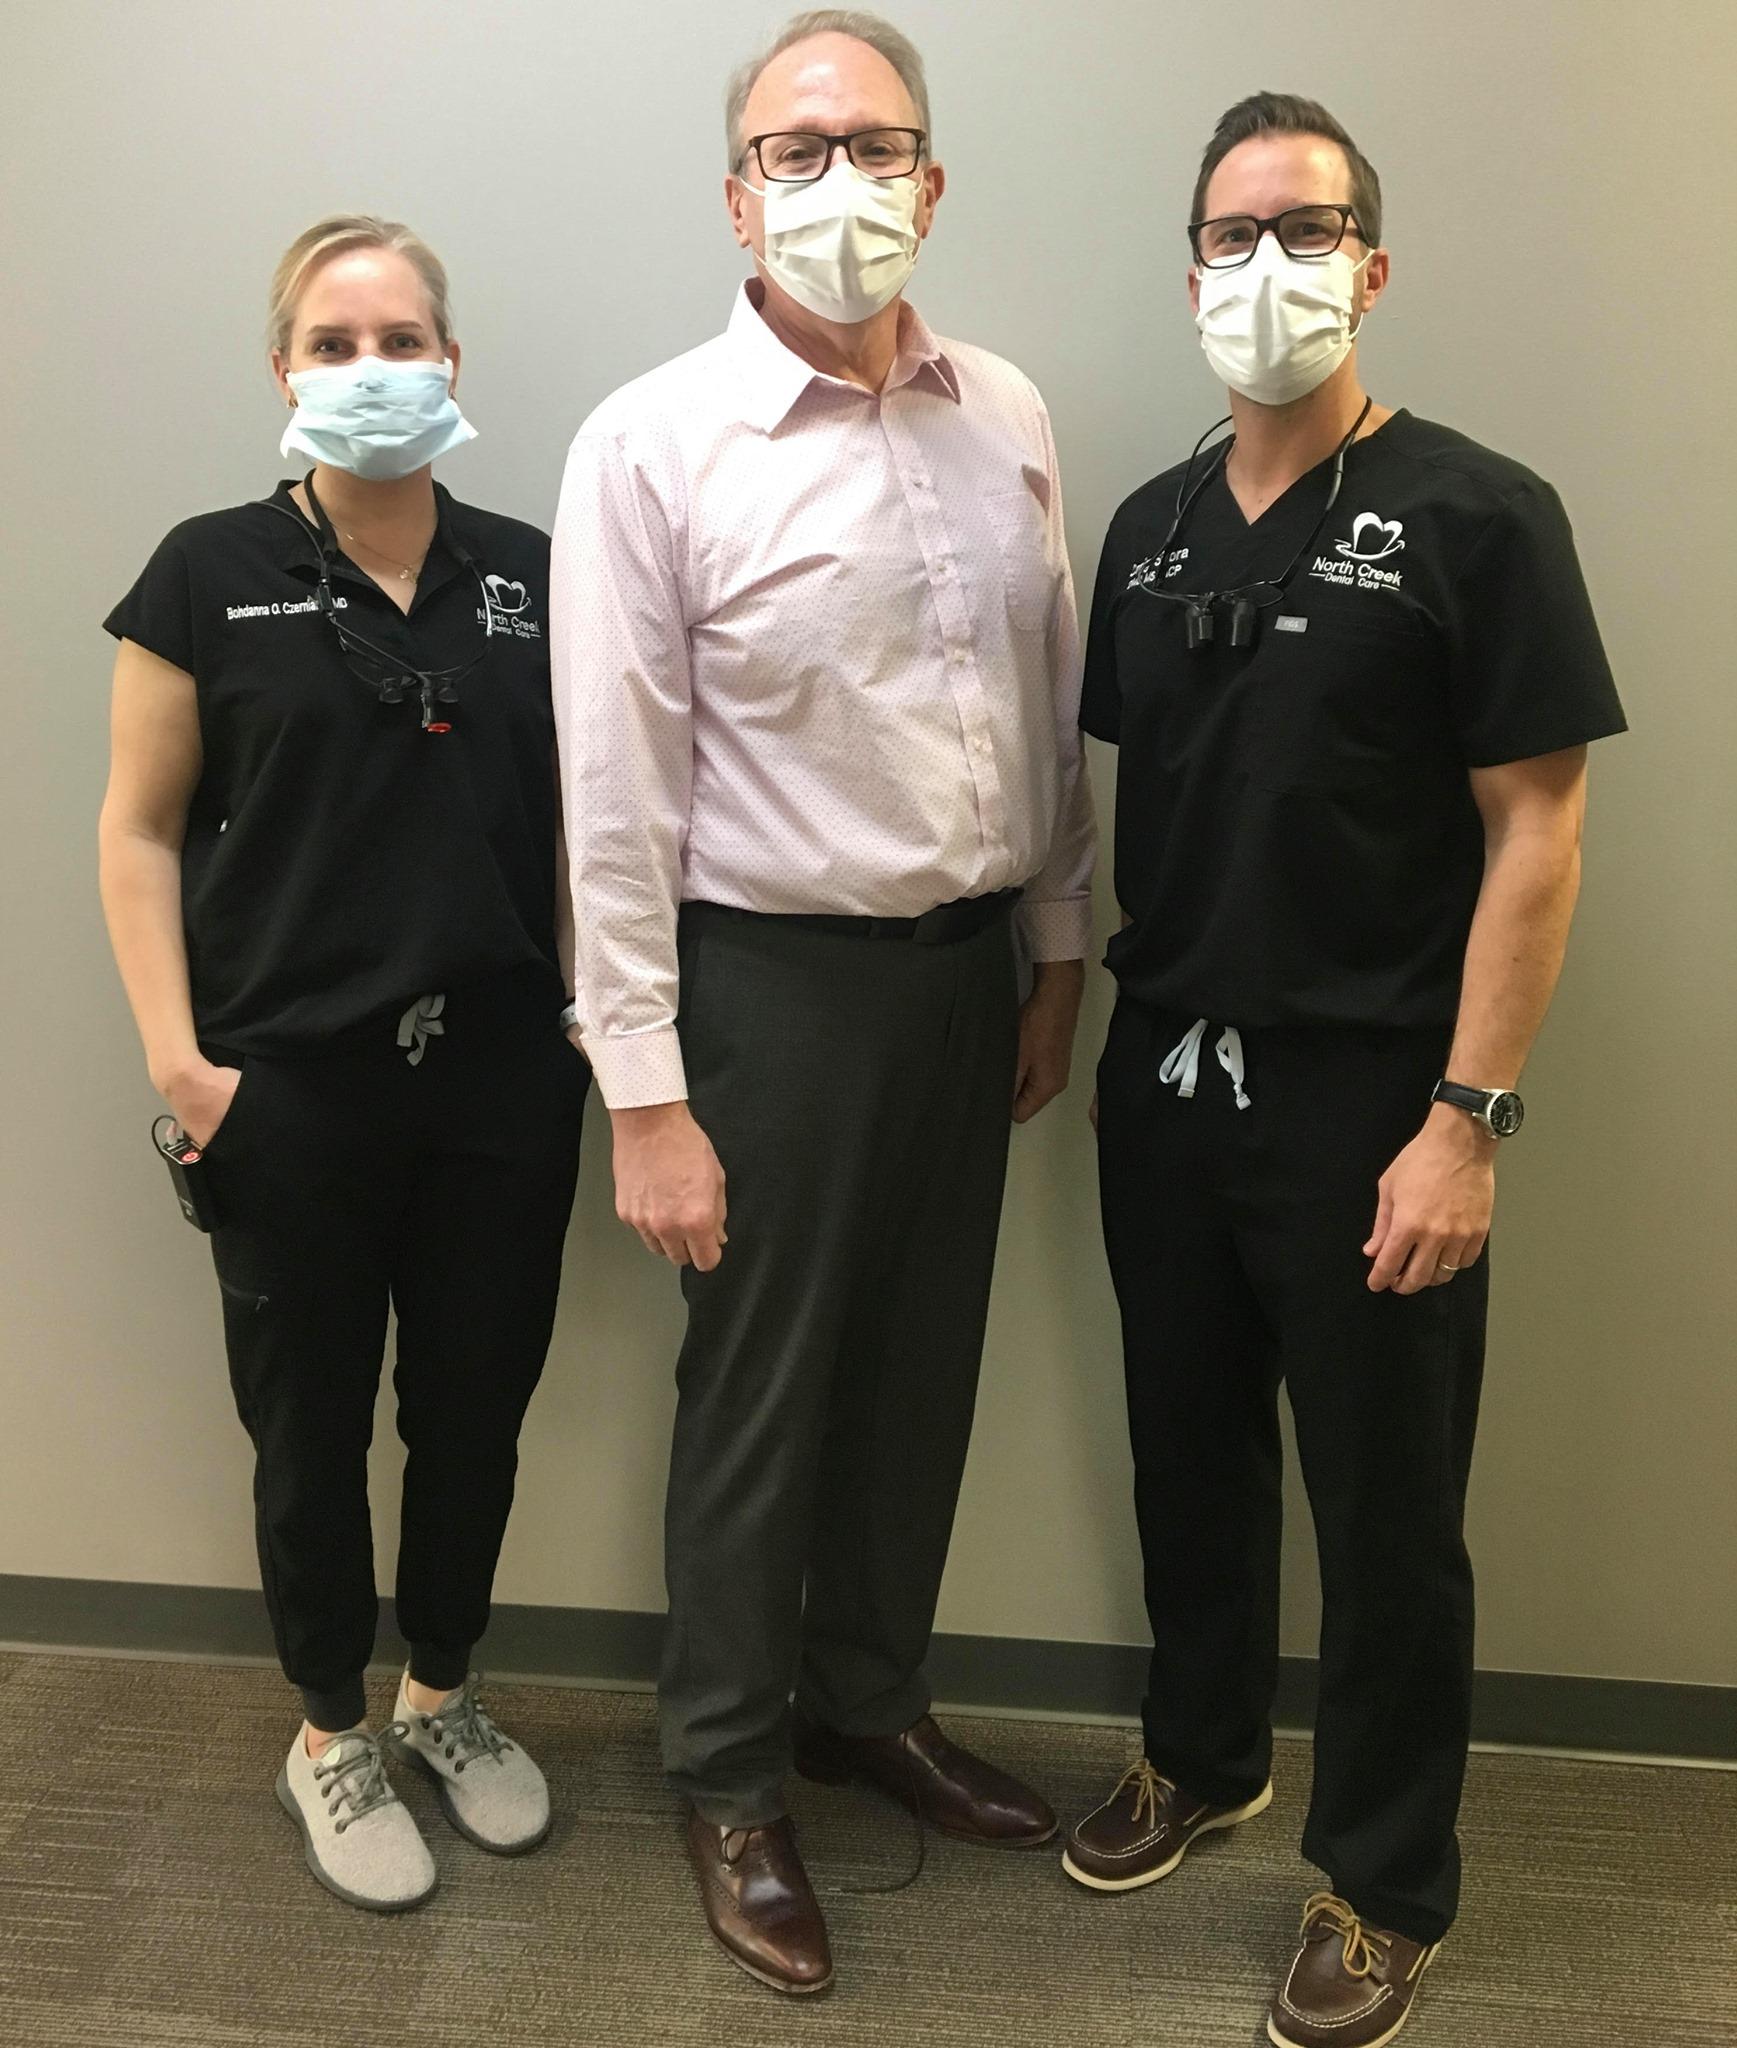 North Creek Dental Care - dentist  | Photo 2 of 6 | Address: 18425 W Creek Dr, Tinley Park, IL 60477, USA | Phone: (708) 532-4131